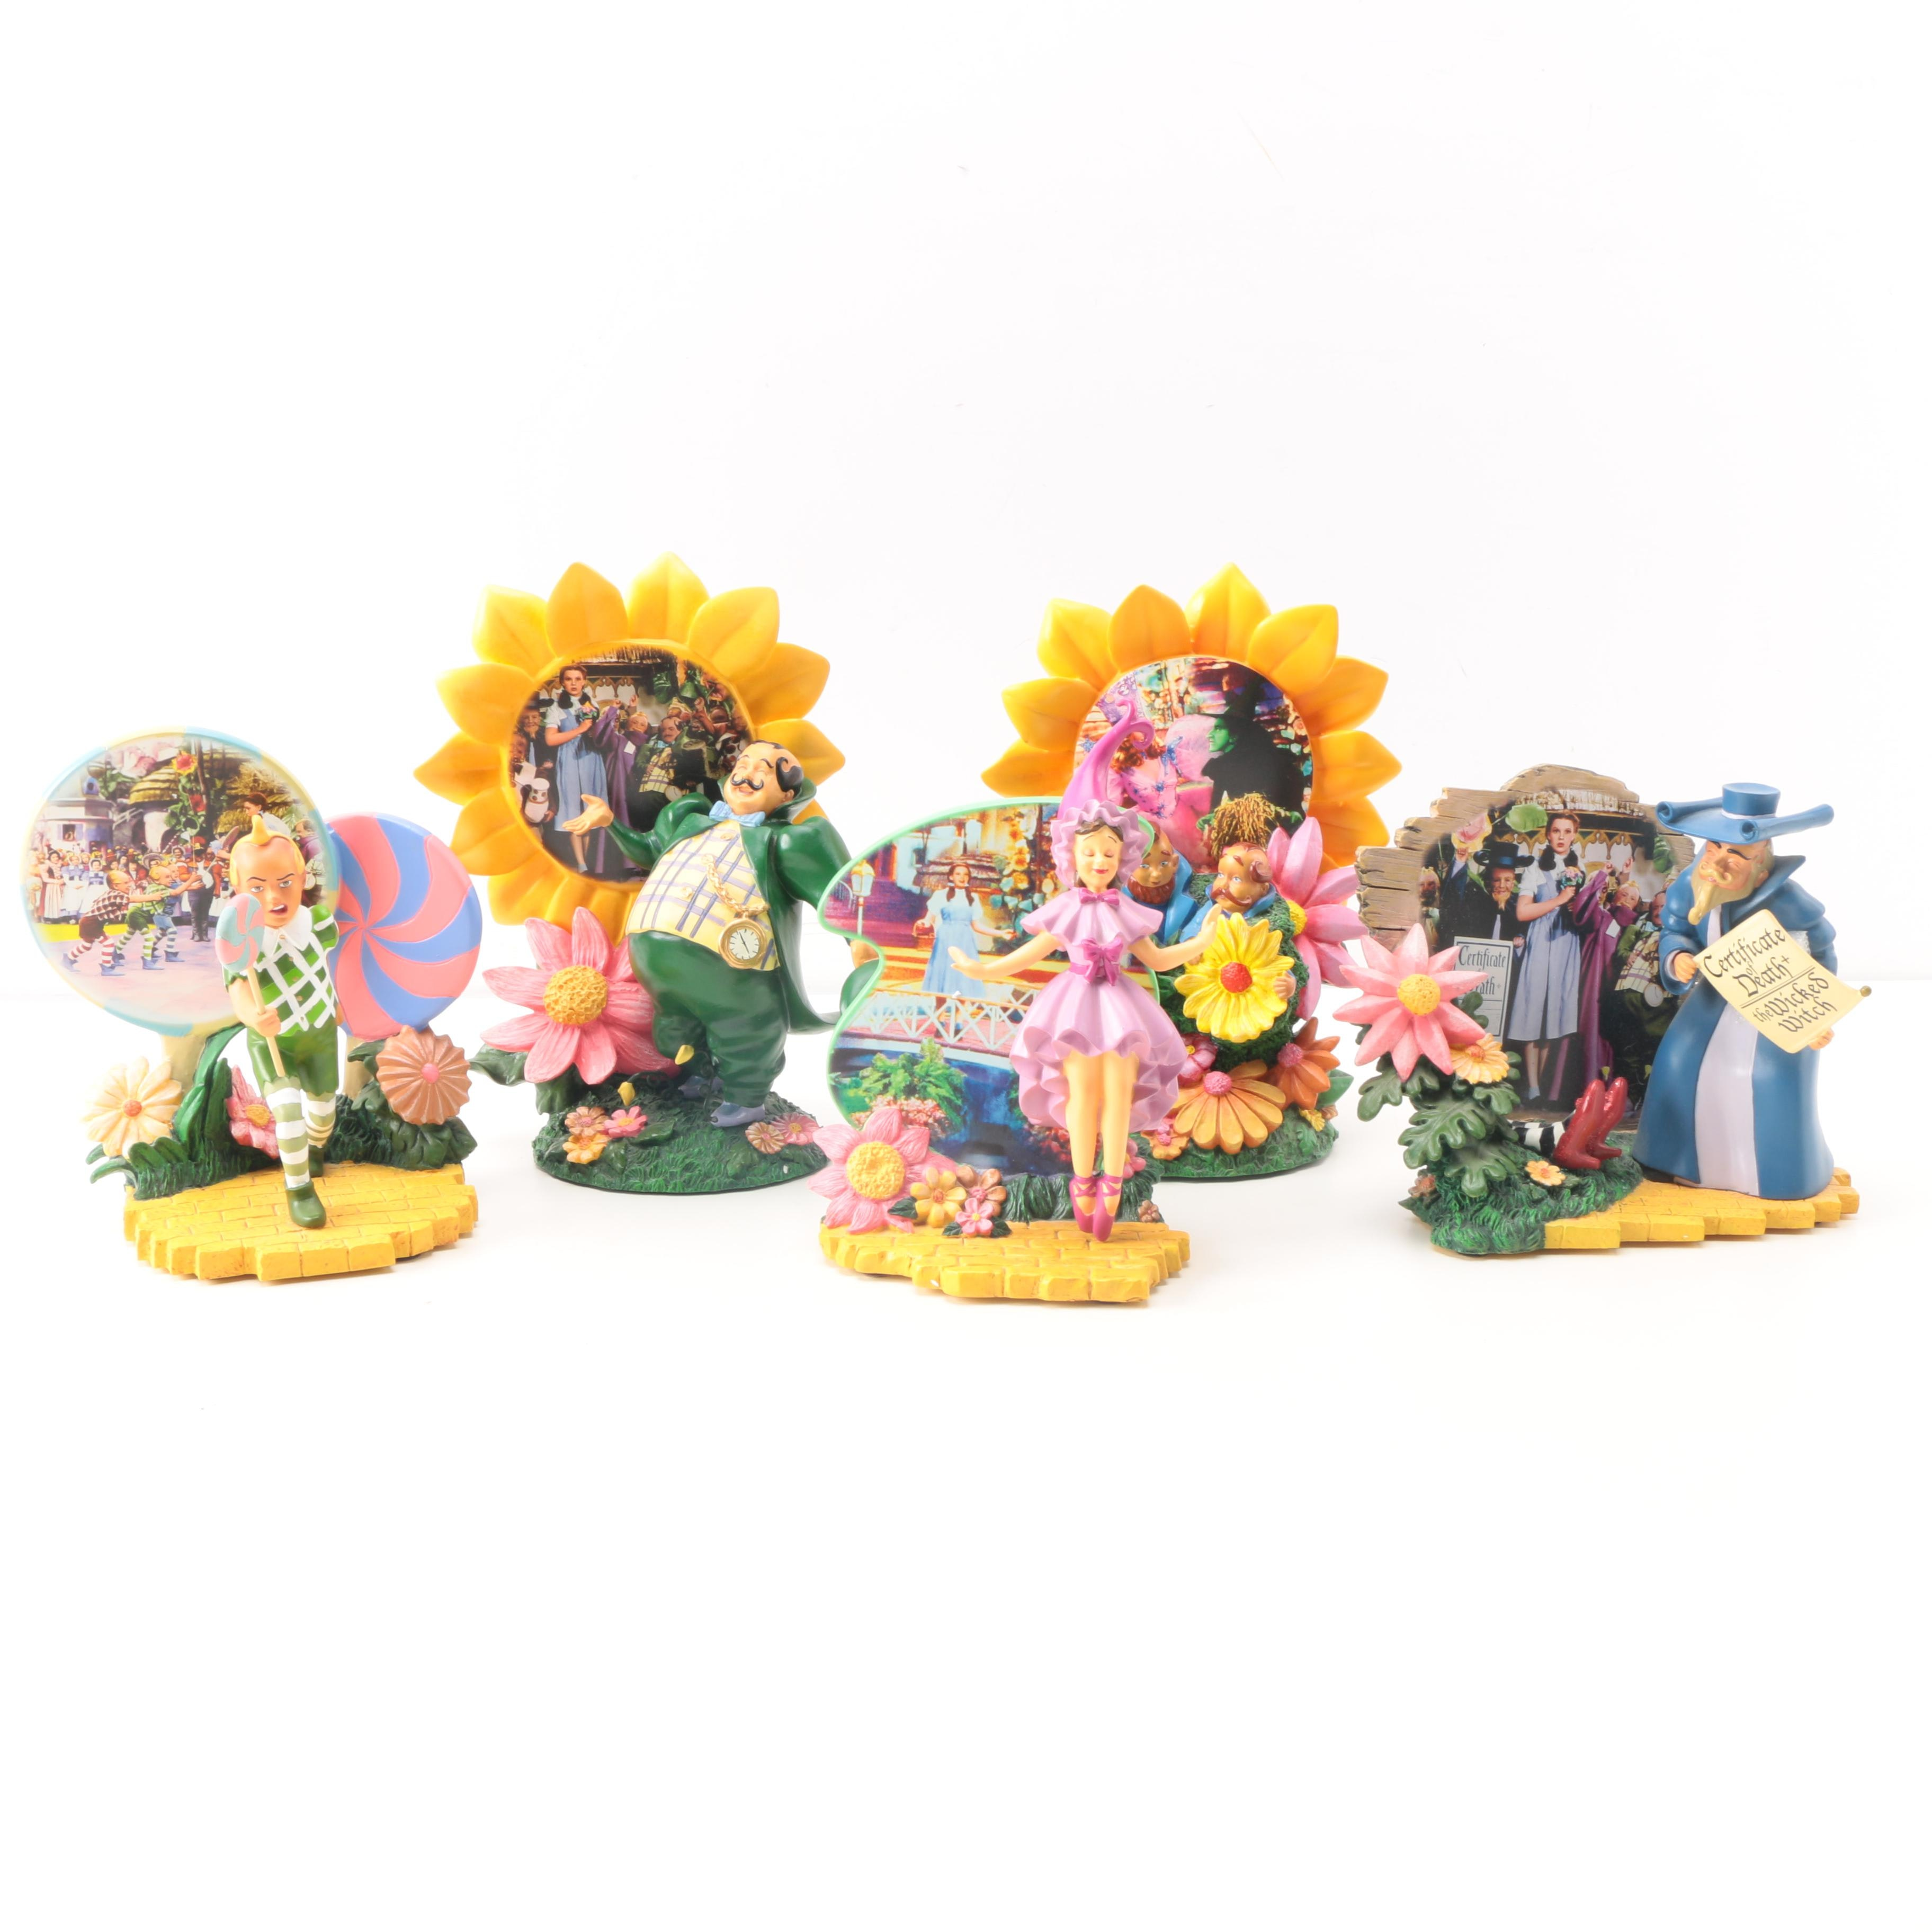 Bradford Exchange Limited Edition Beyond The Rainbow Resin Figurines